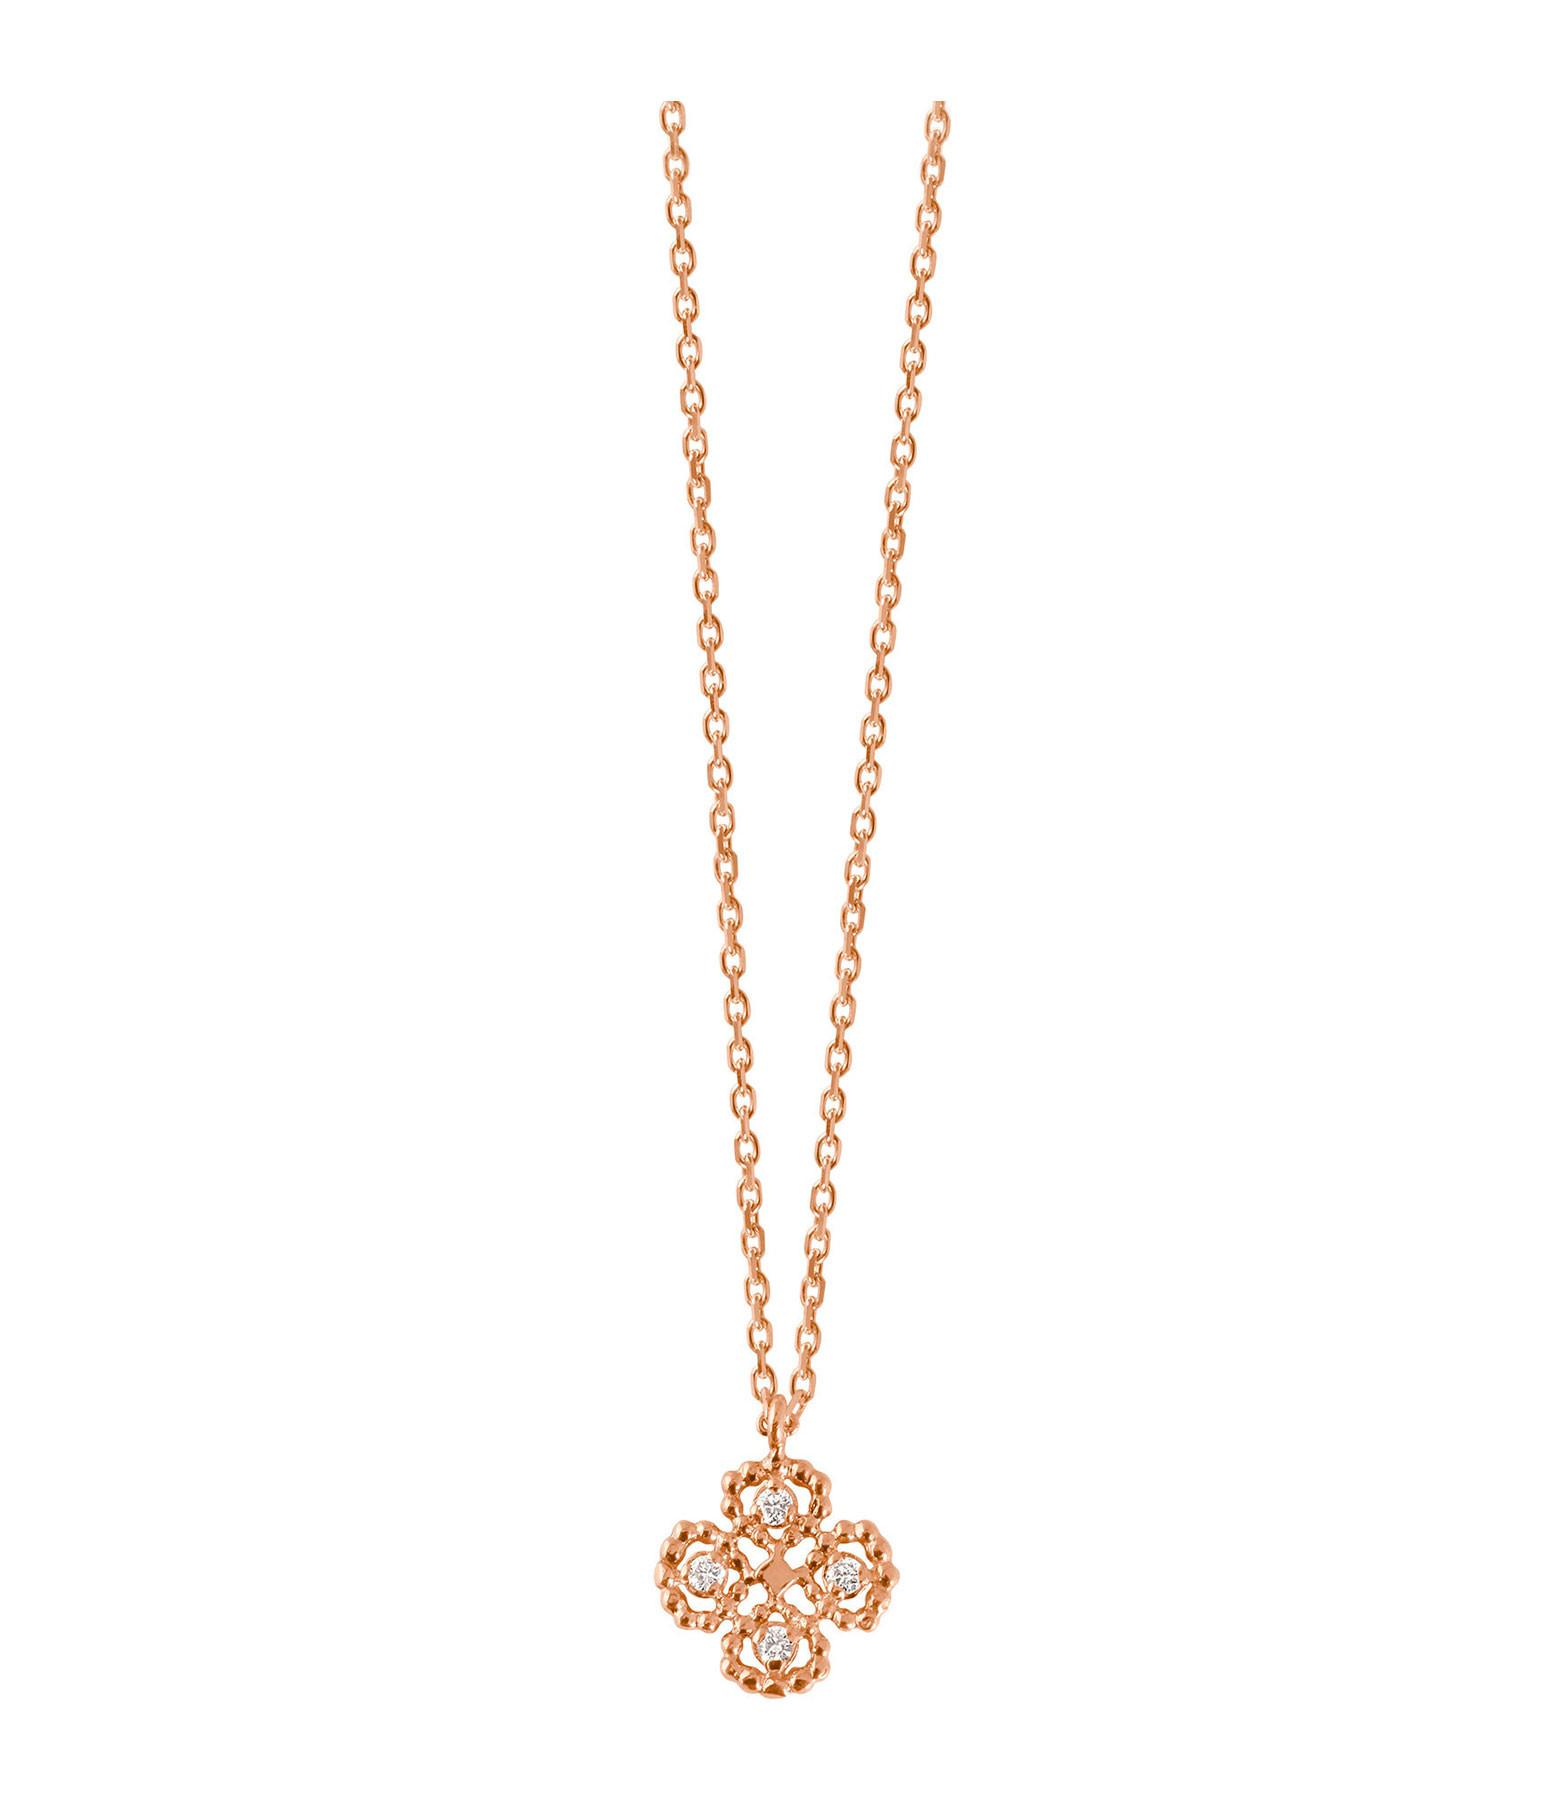 GIGI CLOZEAU - Collier Trèfle Lucky Diamants